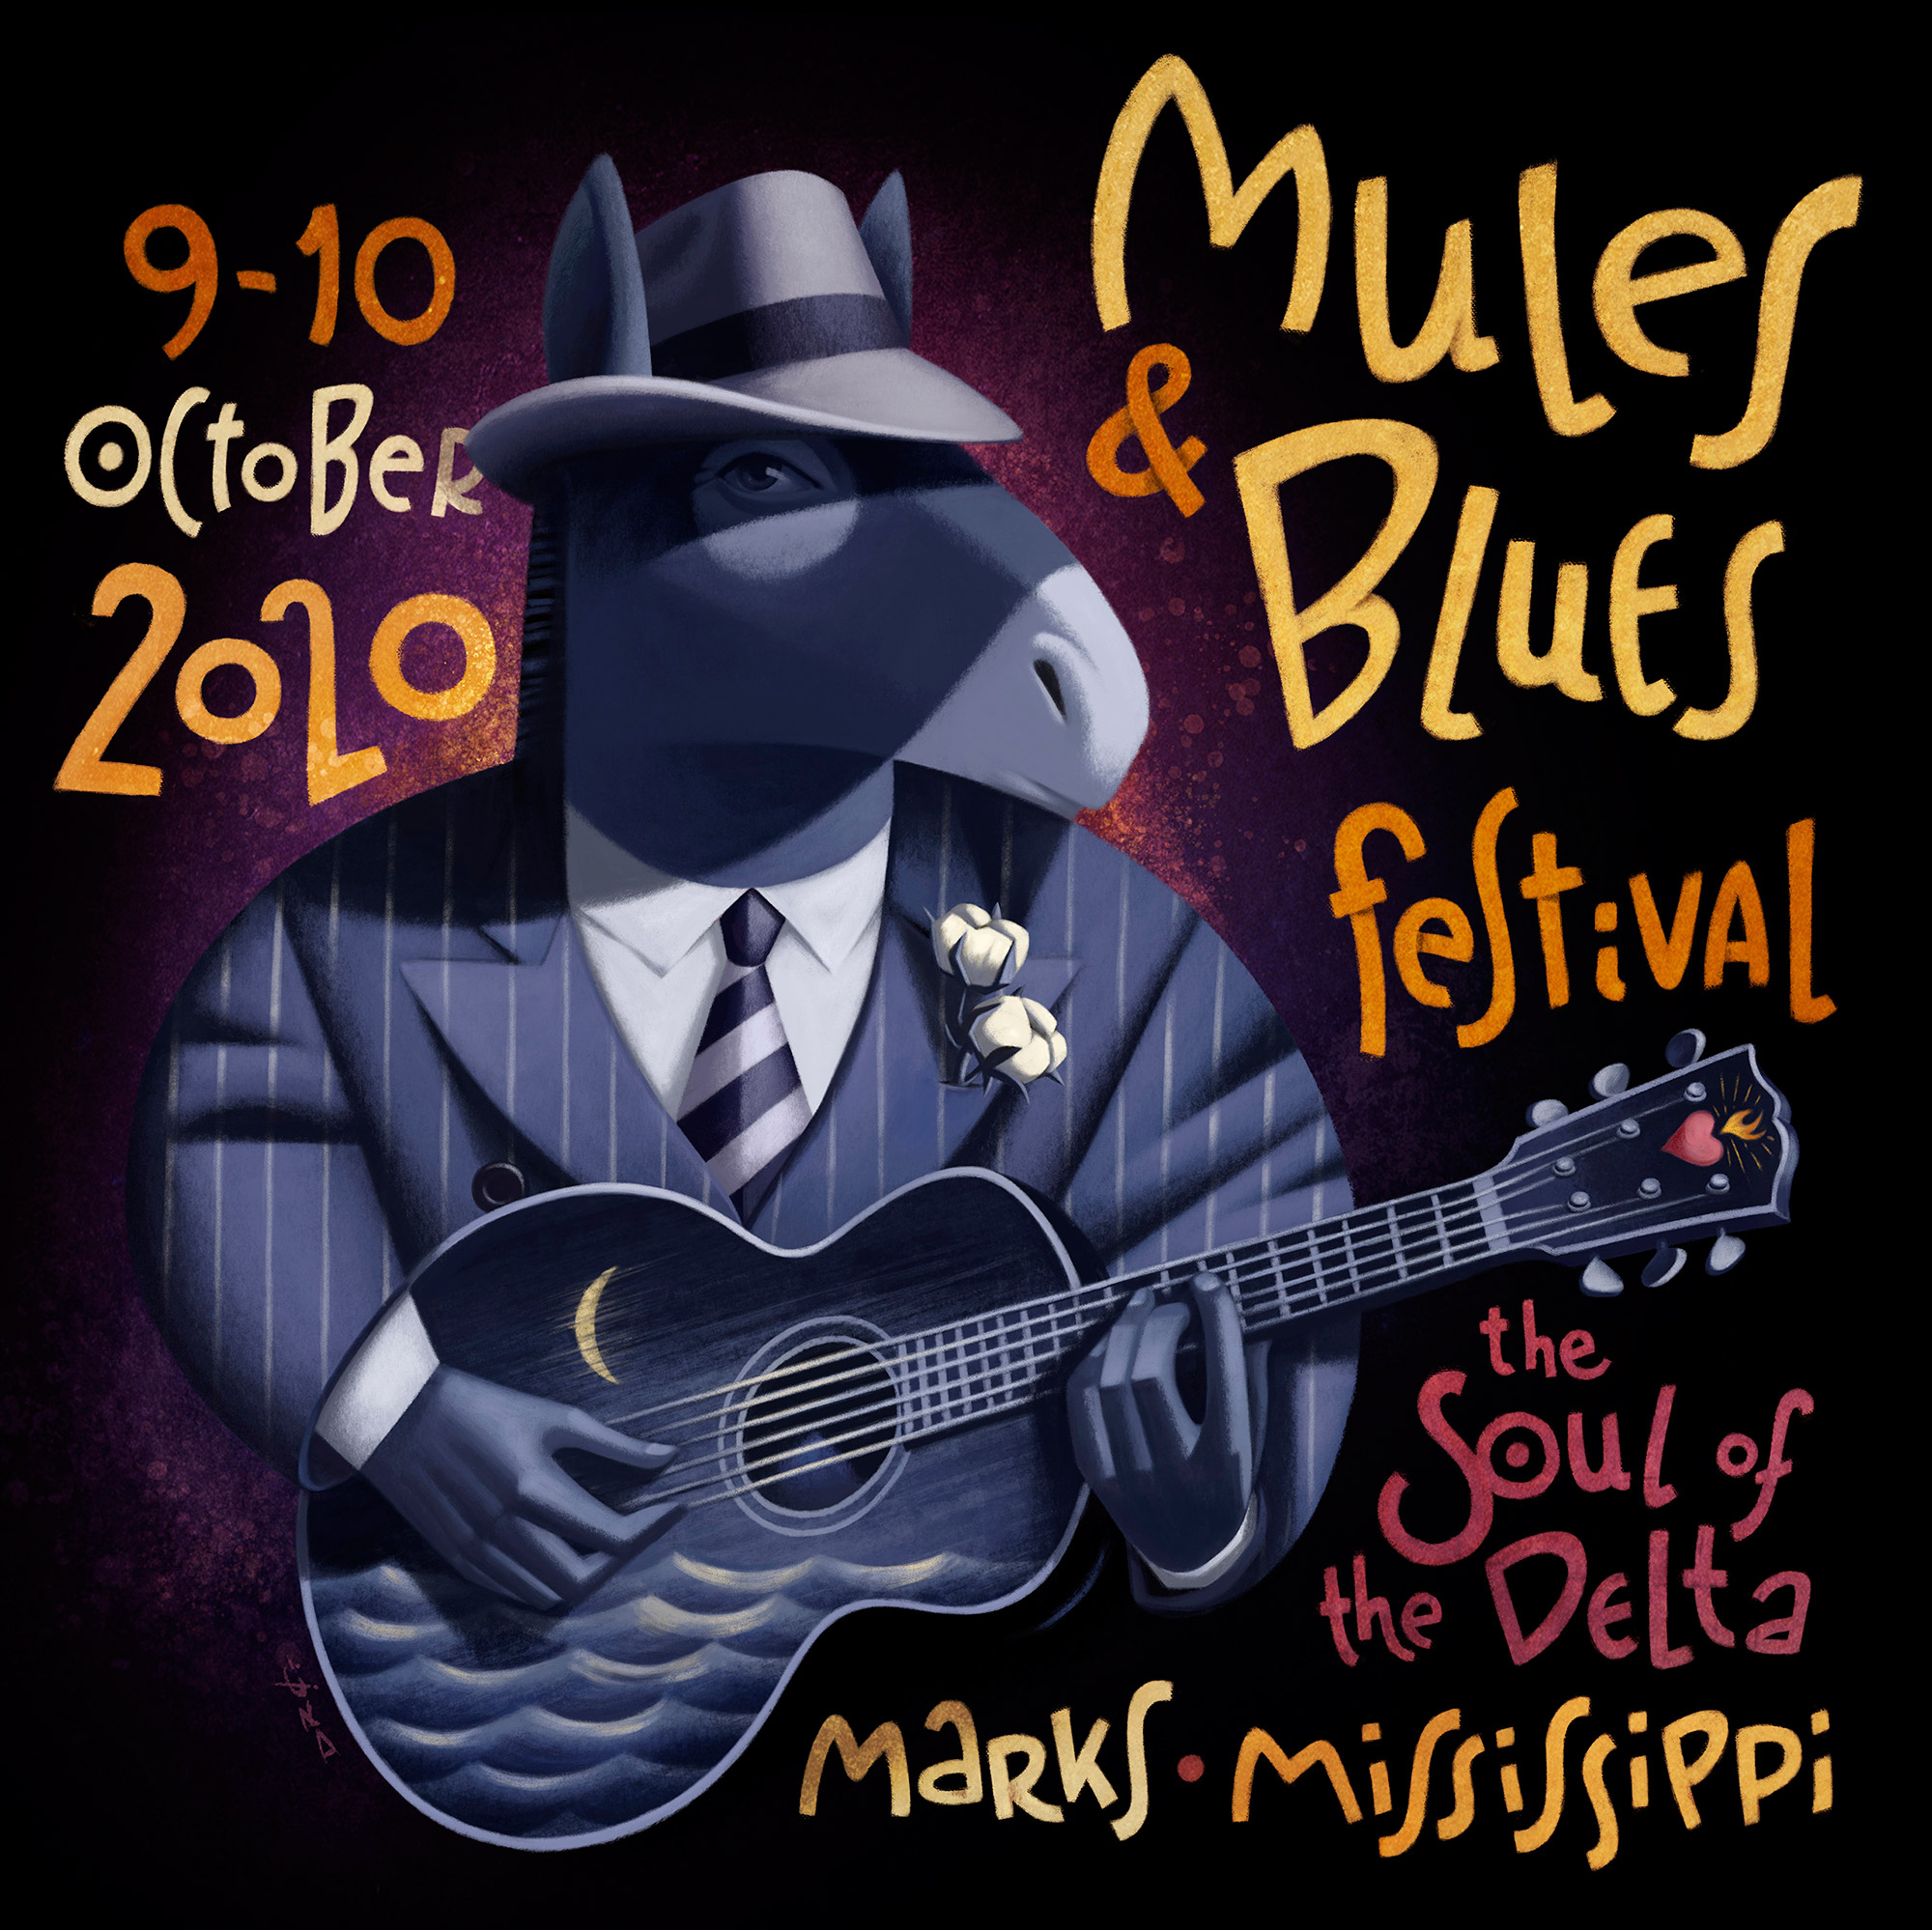 www.davidderamon.com - illustration - mules and blues